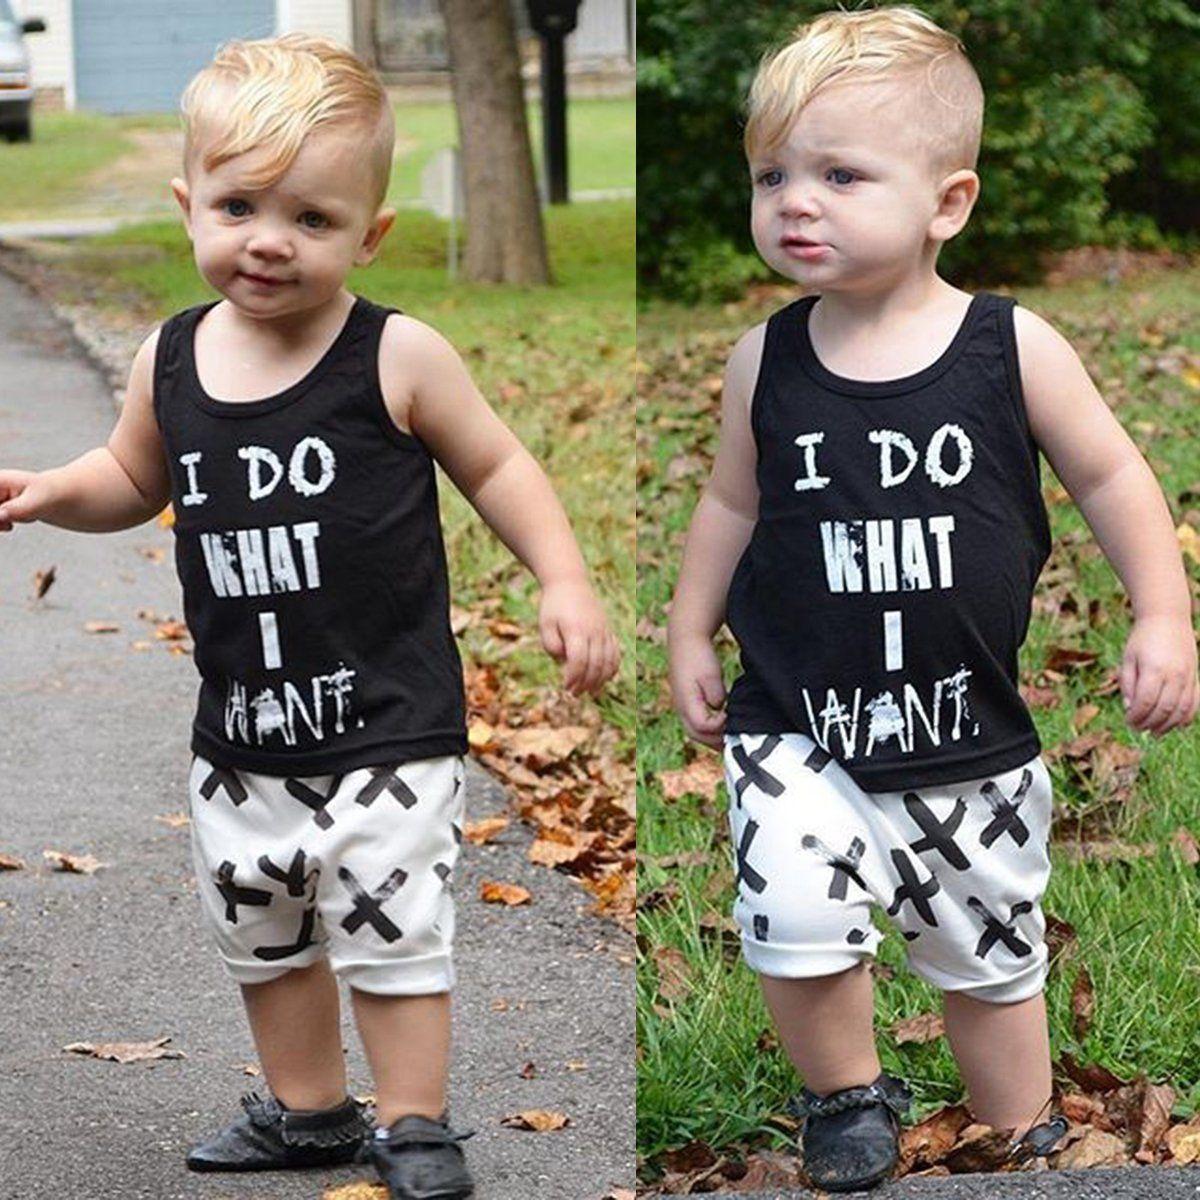 2baf008291a6  6.64 - 2Pcs Toddler Kids Baby Boy T-Shirt Tops+Pants Summer Casual Outfits  Clothing Set  ebay  Fashion